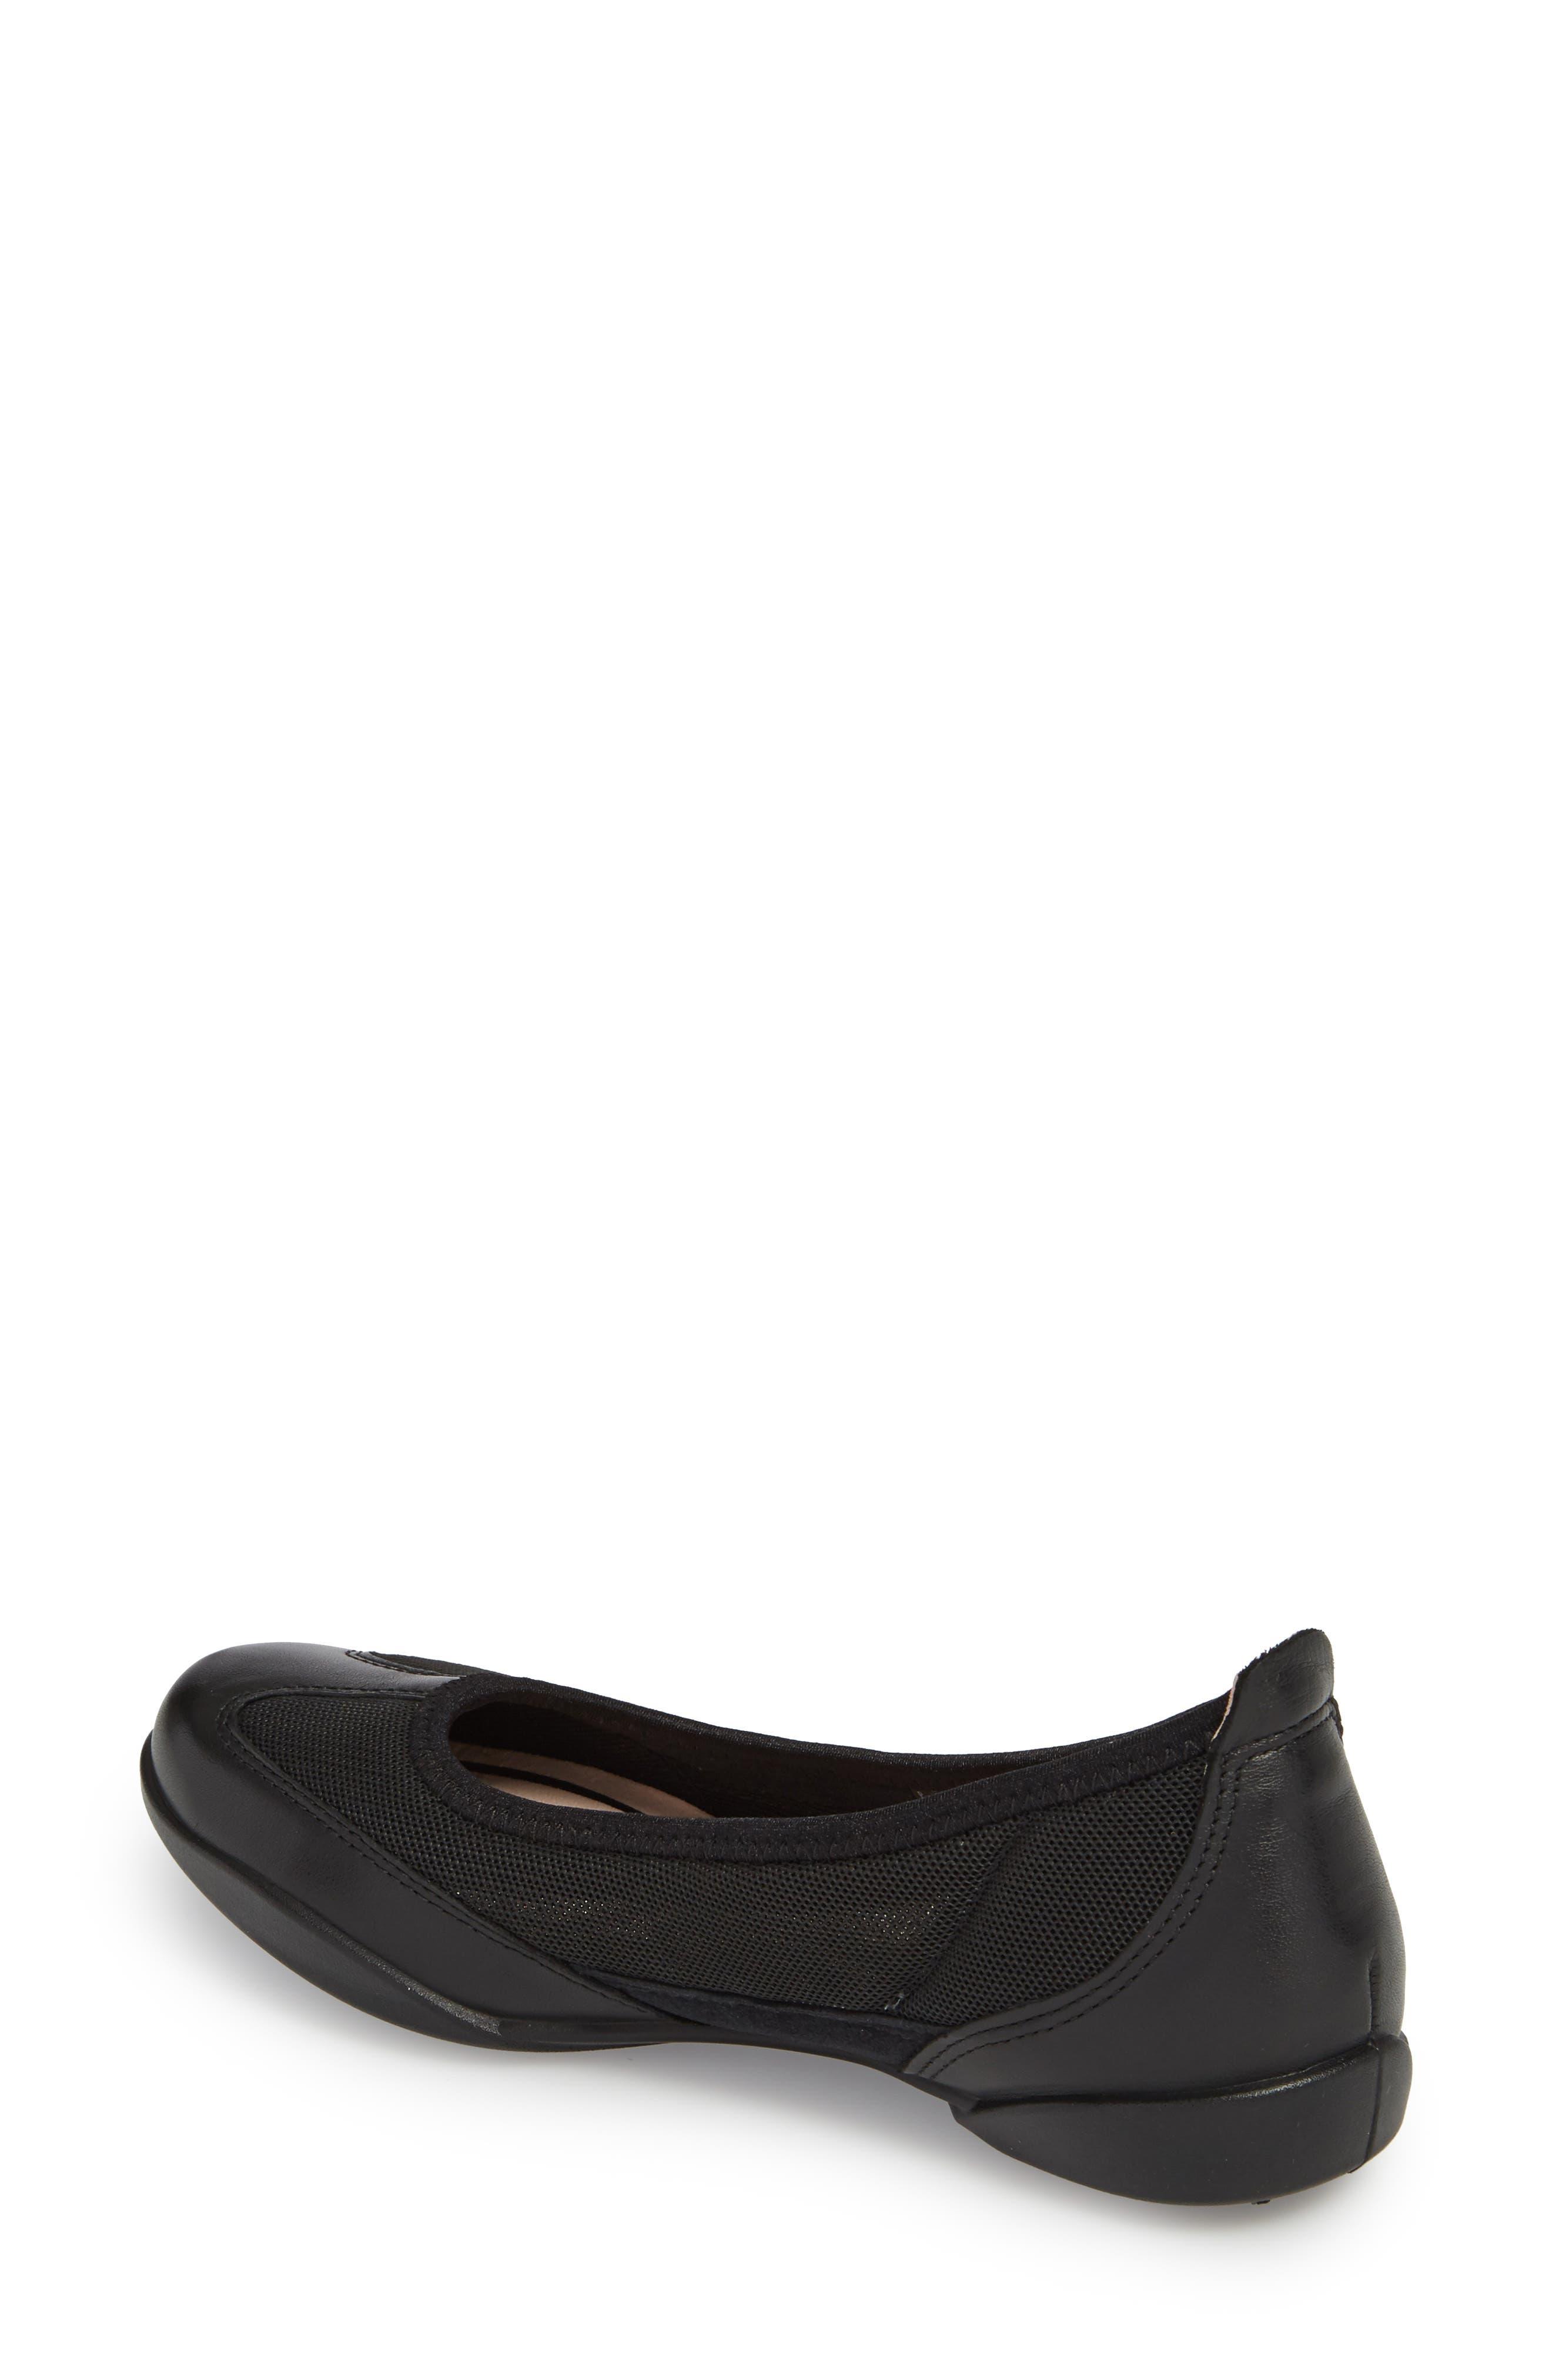 ECCO, 'Bluma' Ballet Sneaker, Alternate thumbnail 2, color, BLACK LEATHER